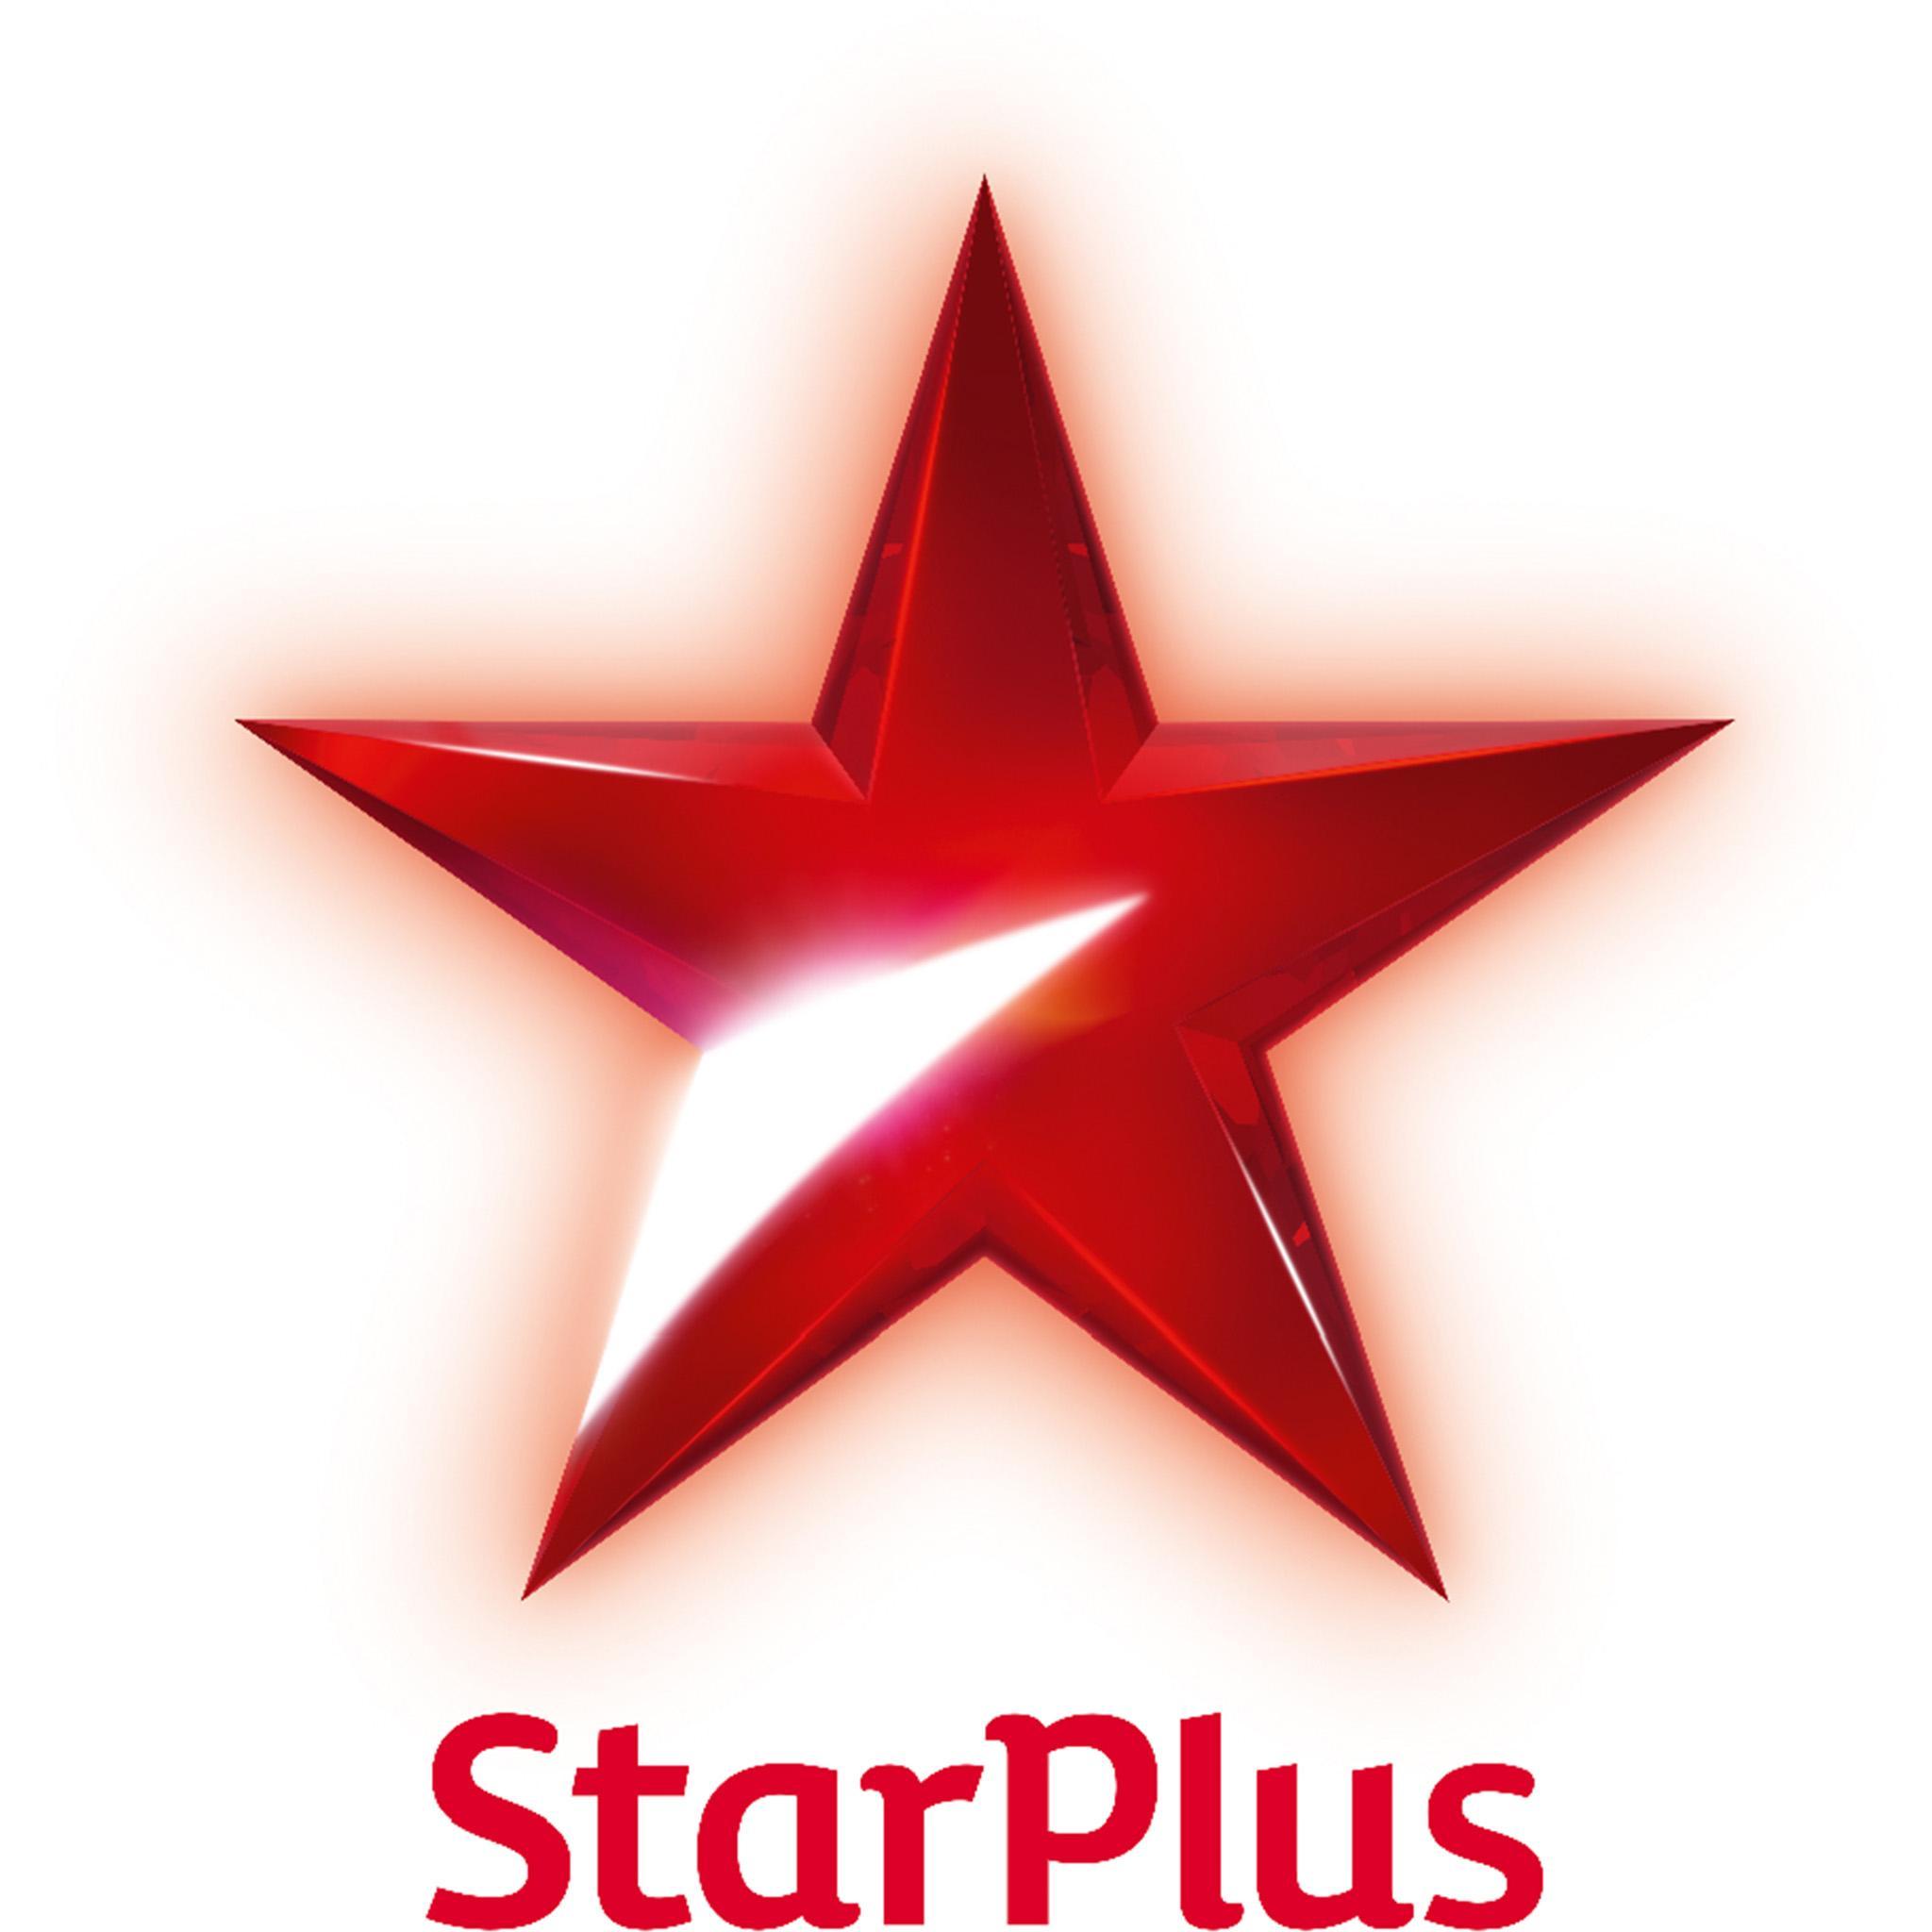 http://www.indiantelevision.com/sites/default/files/styles/smartcrop_800x800/public/images/tv-images/2016/08/12/Star%20Plus.jpg?itok=XRzvAOBv